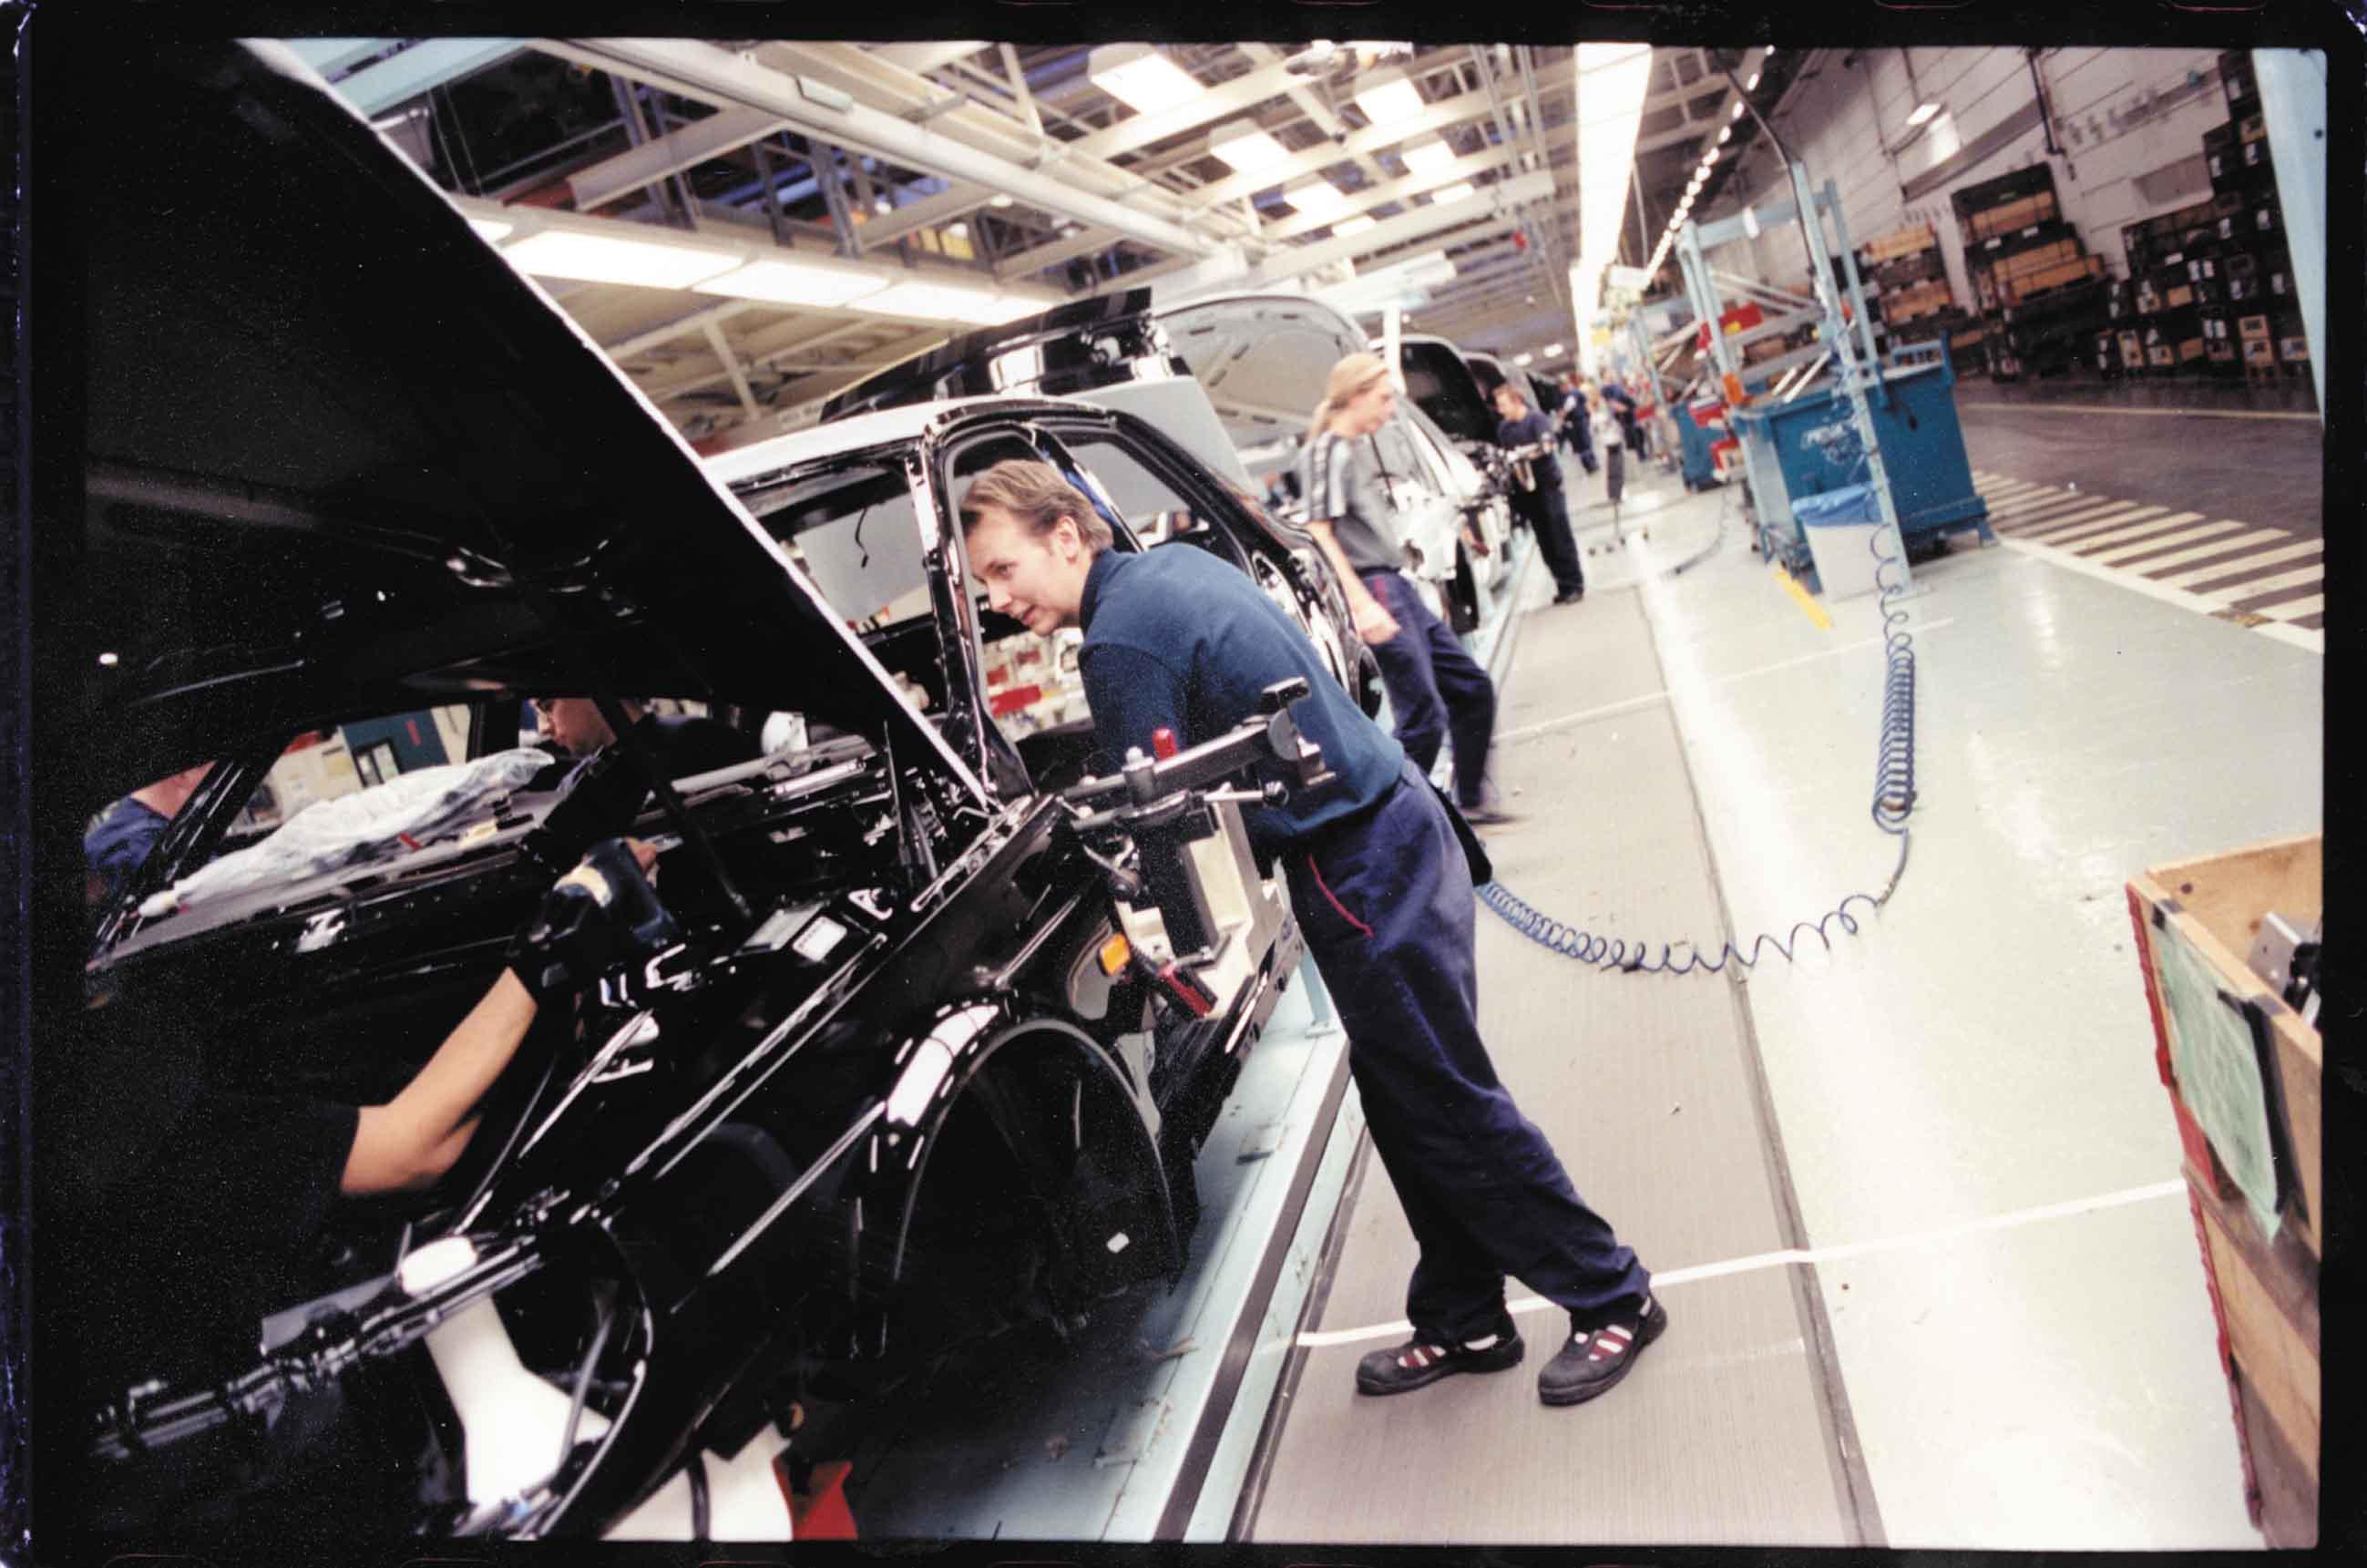 Flexibilitet – en handelsvara i kampen om jobben